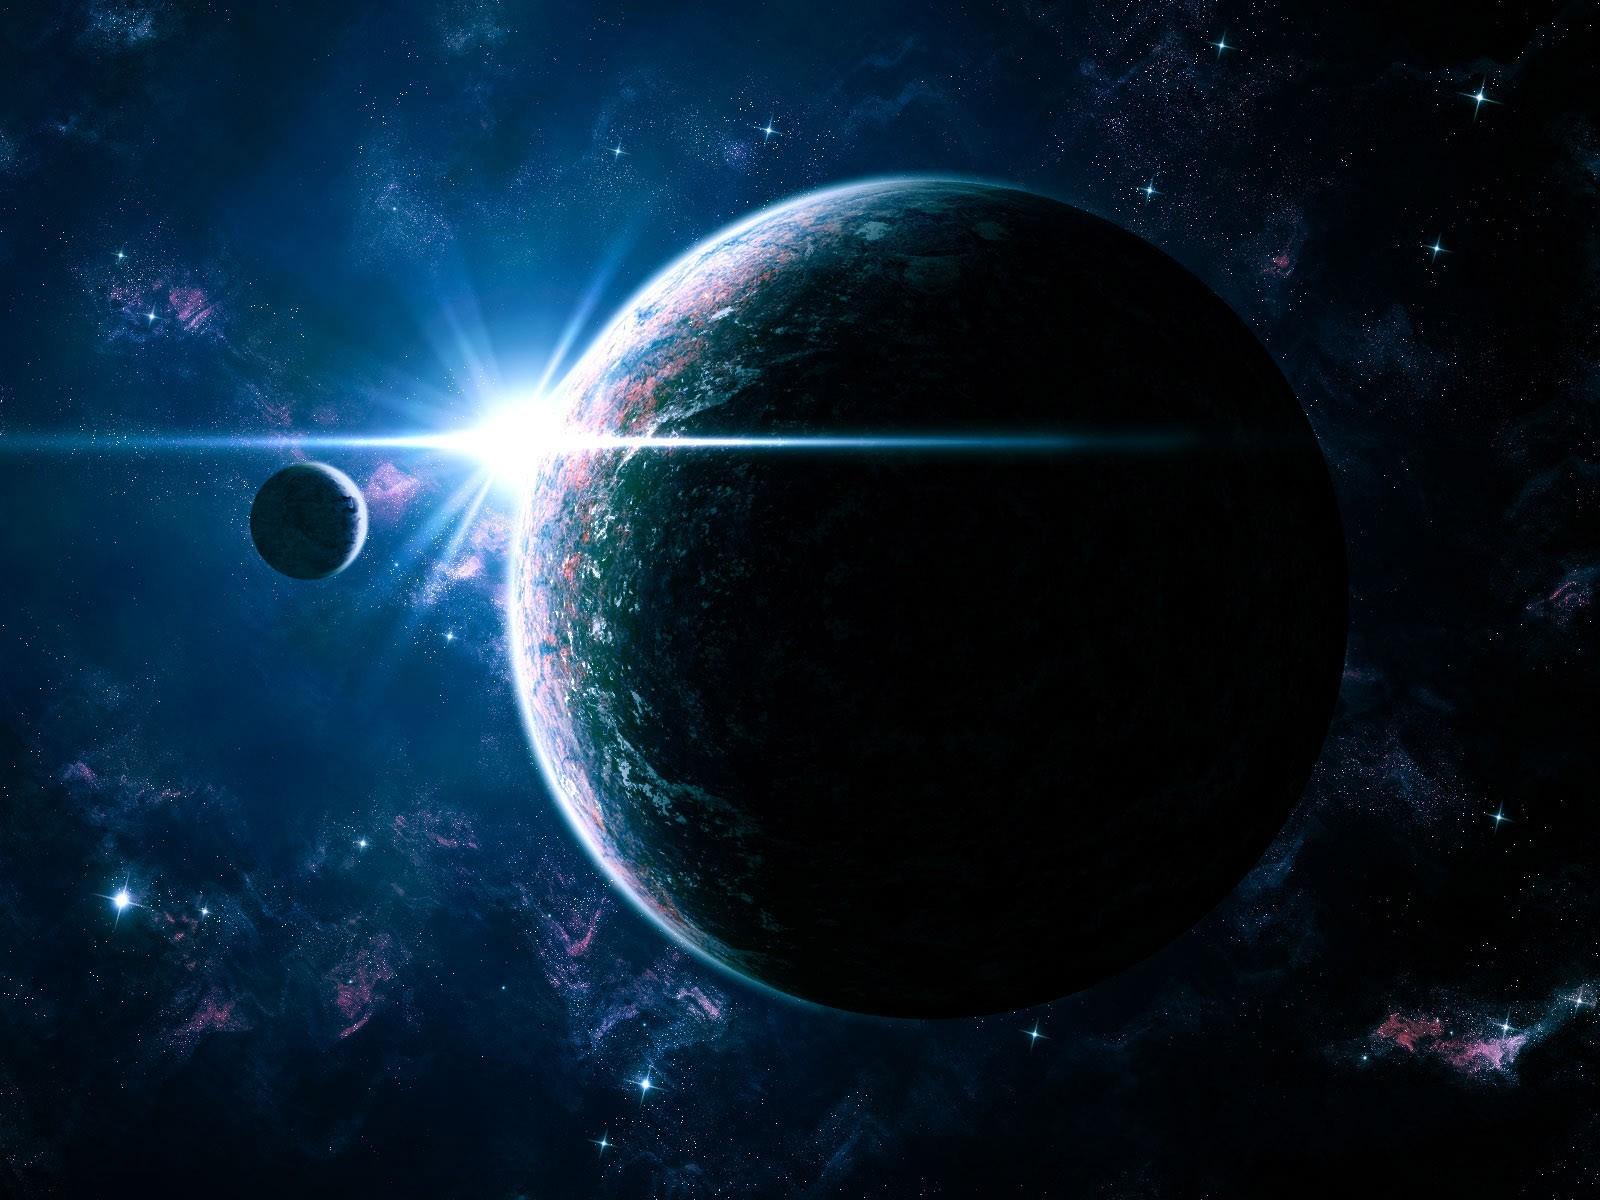 40 Gambar Fantasi Luar Angkasa Super Keren